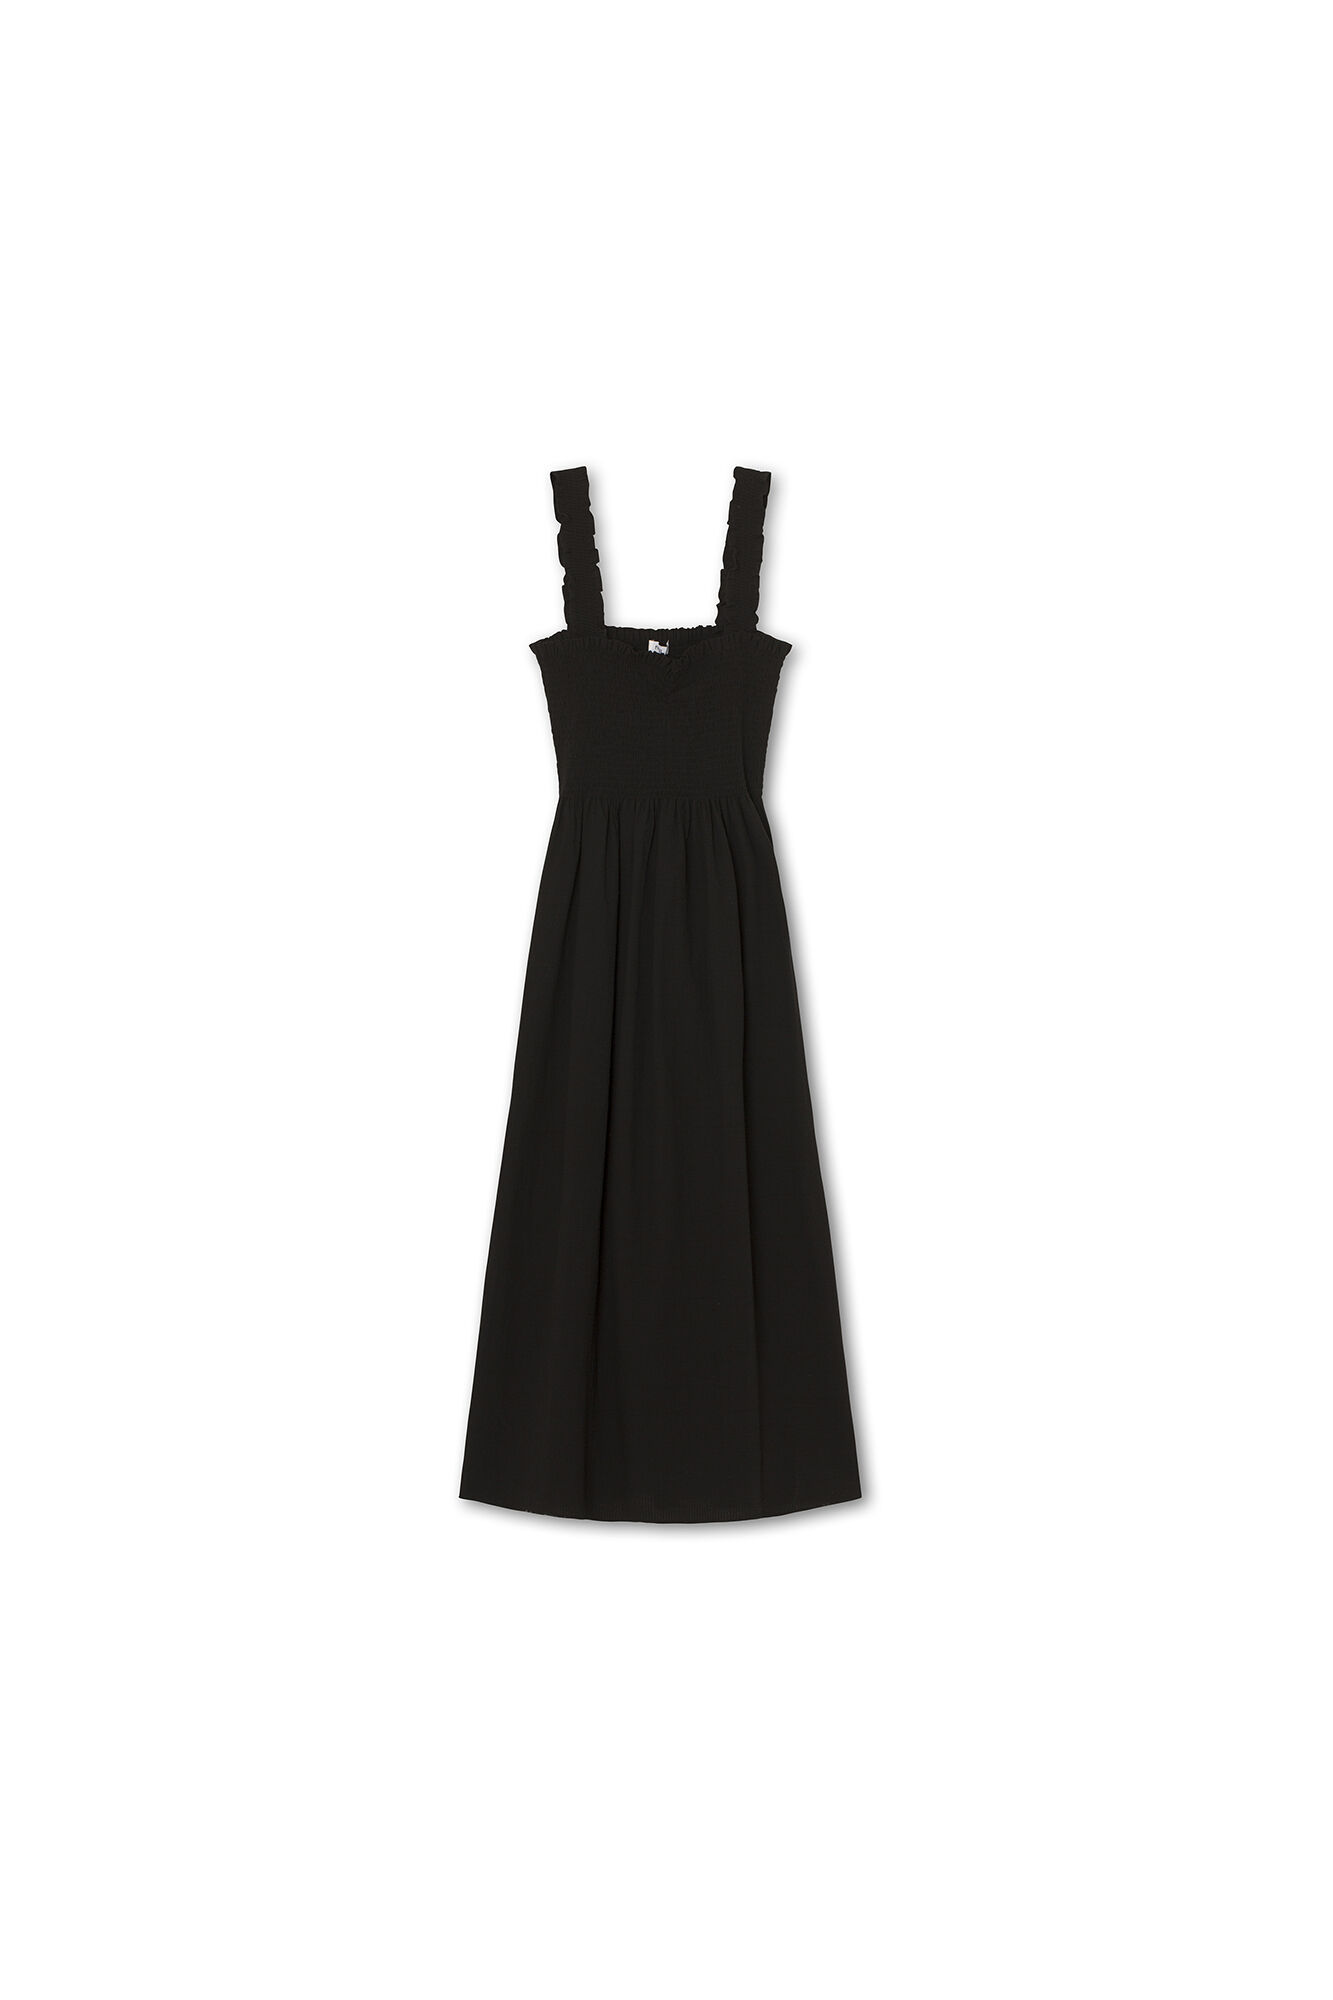 ENPARSLEY DRESS 6826, BLACK